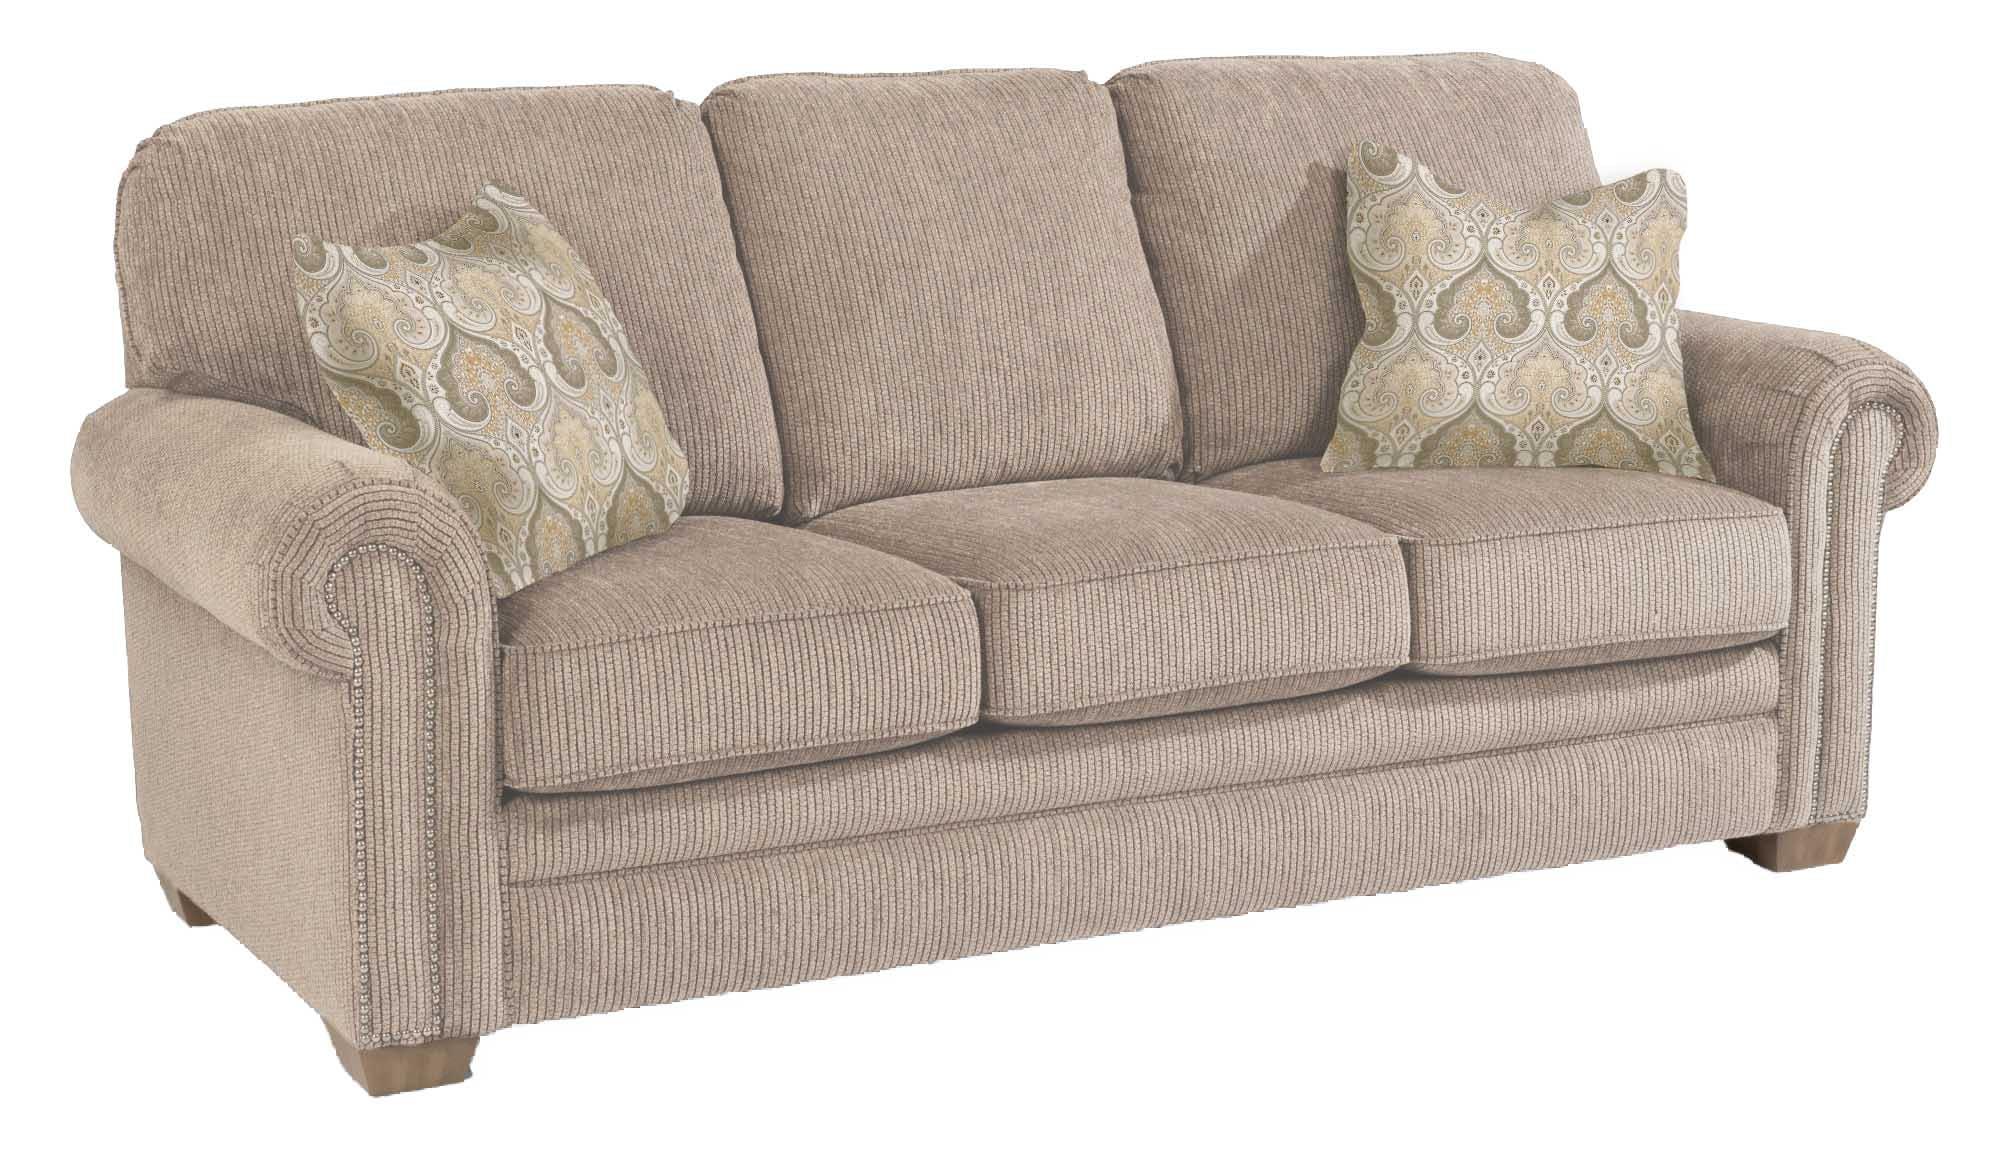 Flexsteel Living Room Sofa 88 W/Nailhead Trim Harrison 436866